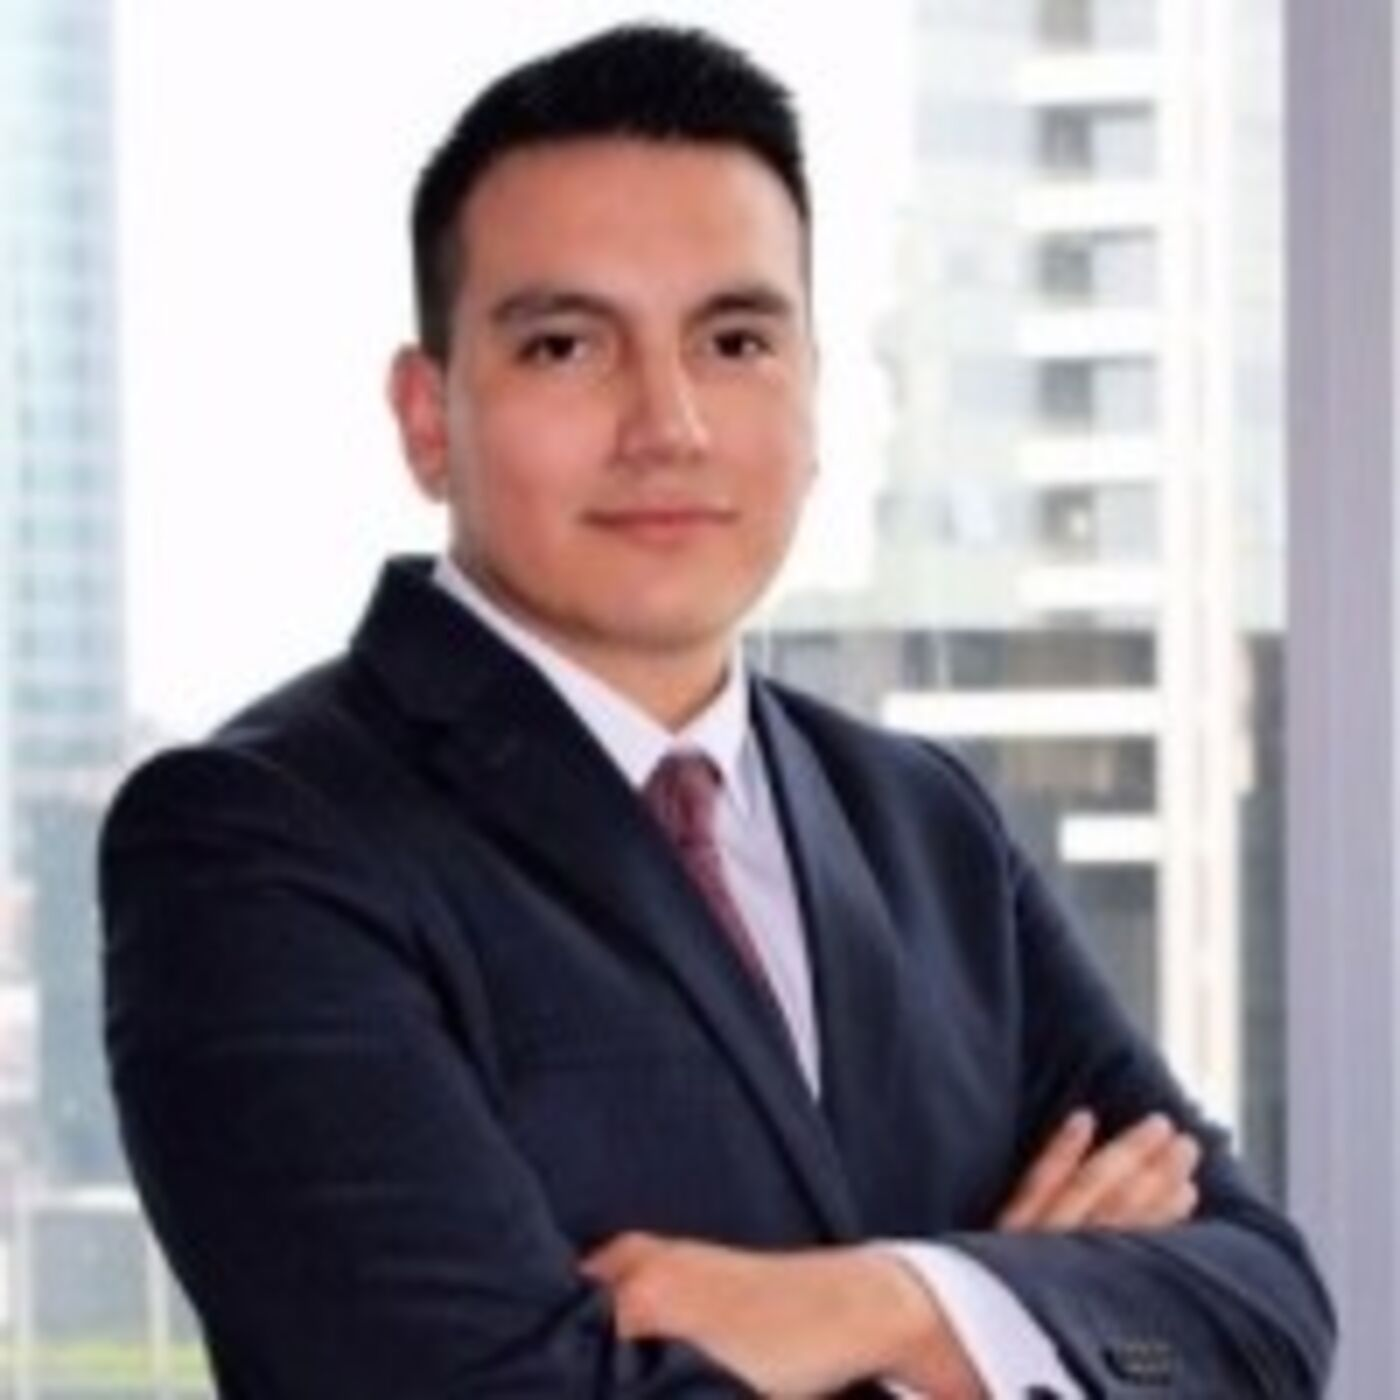 147th Episode with Cristhian Ortiz Elizabeth, Human Capital Senior Consultant at Deloitte Perú